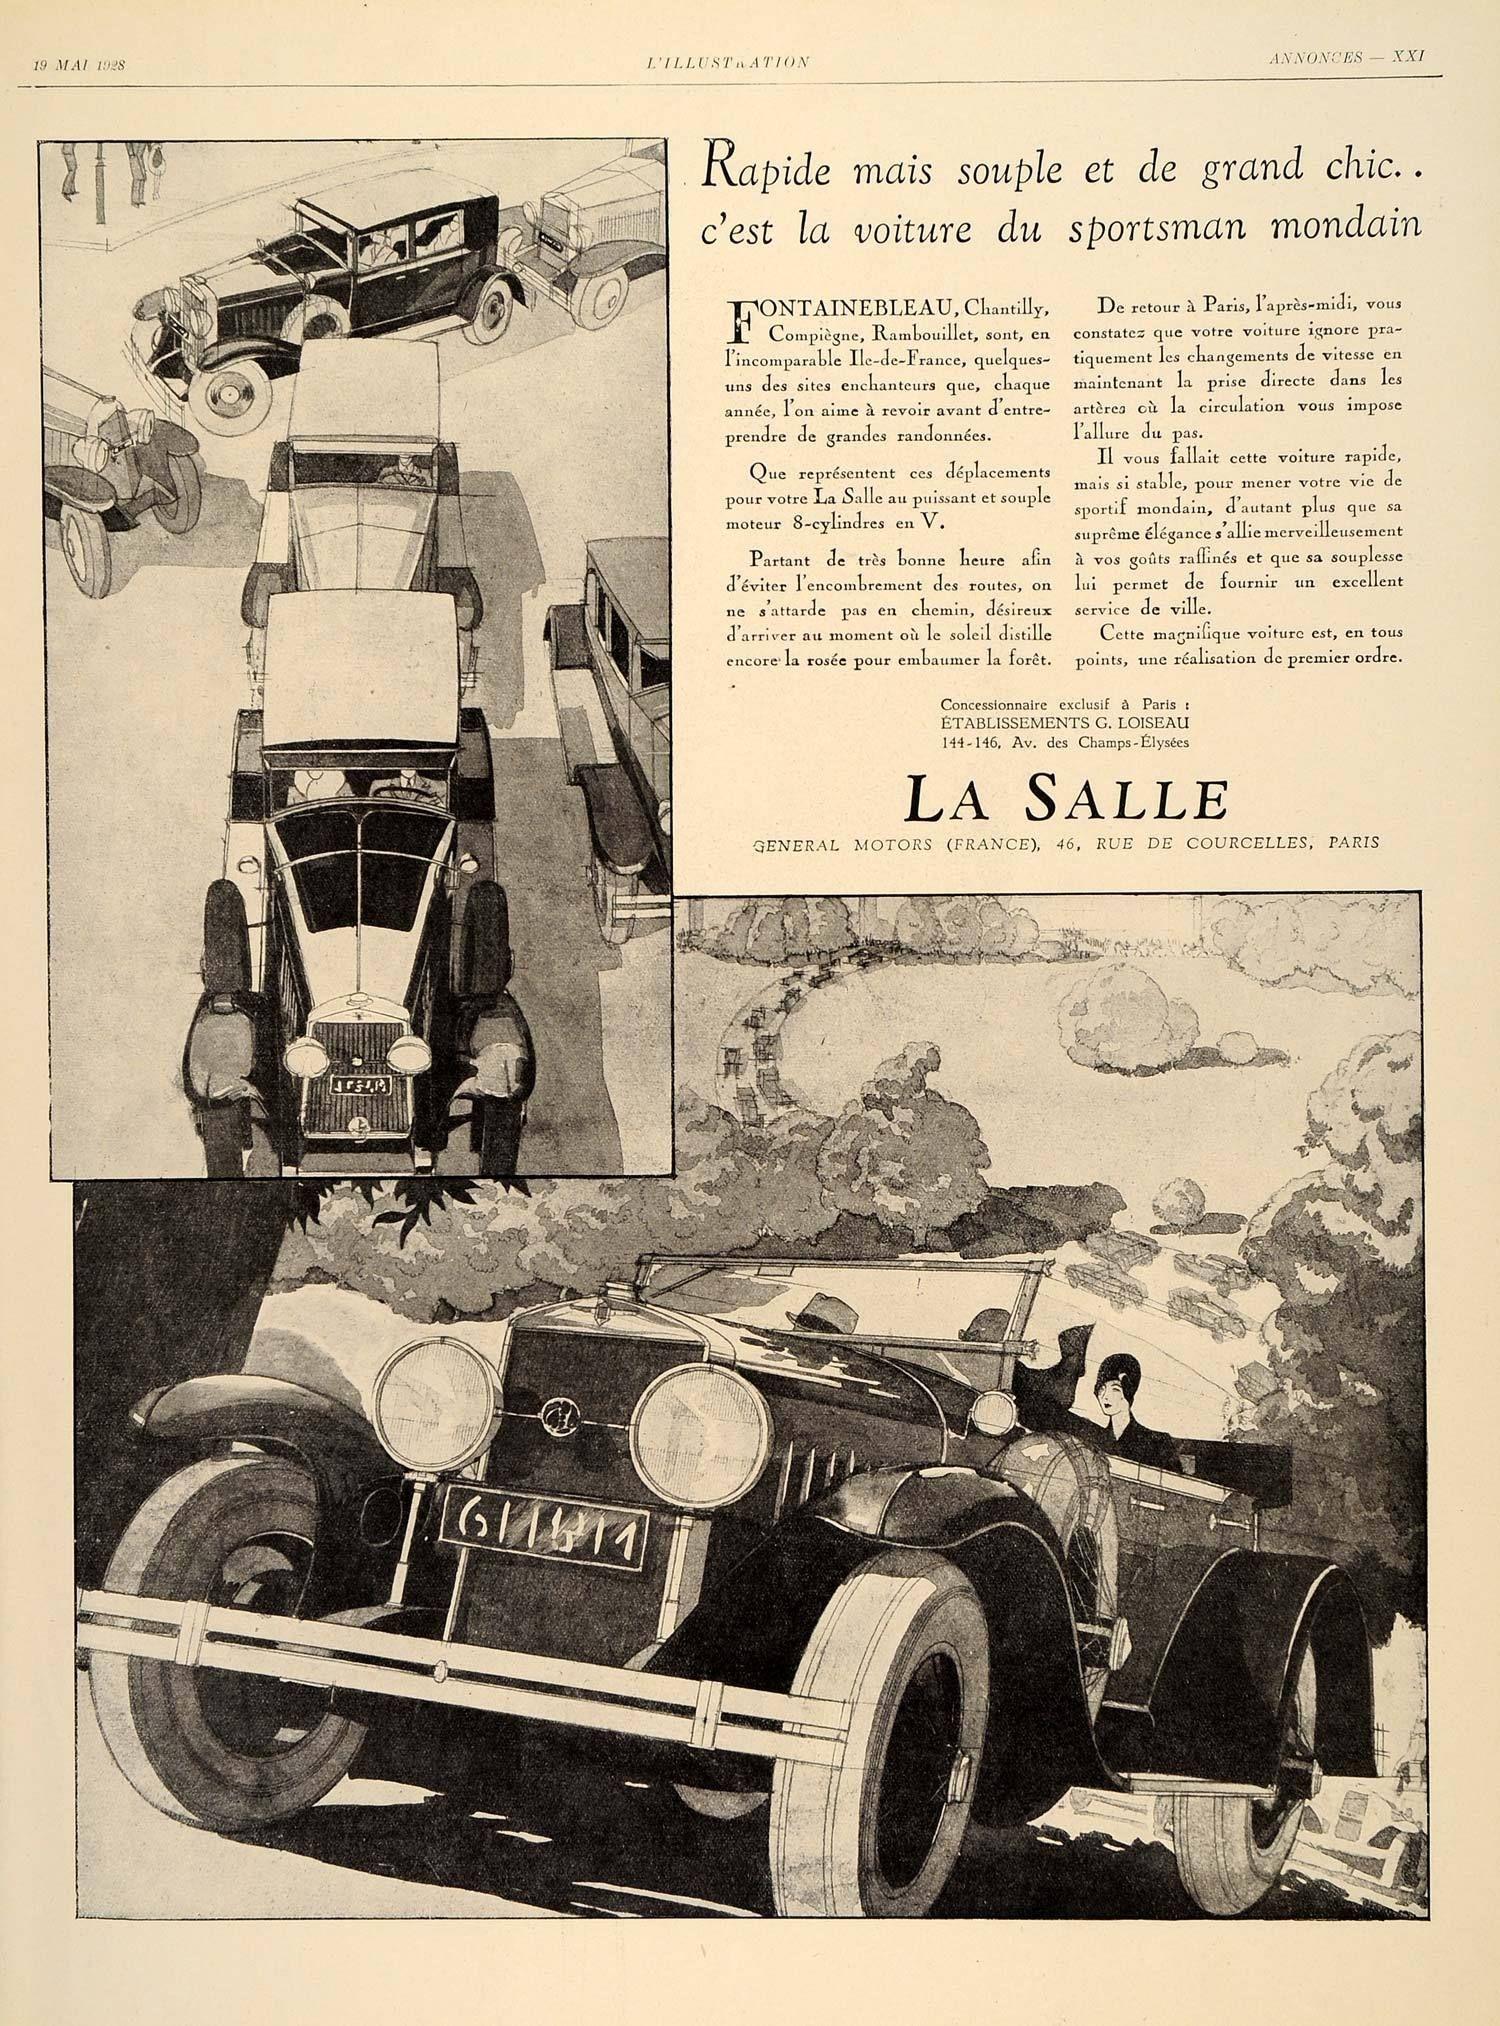 1928 Ad La Salle General Motors Cars French Automobile Original Ill3 General Motors Cars General Motors Automobile